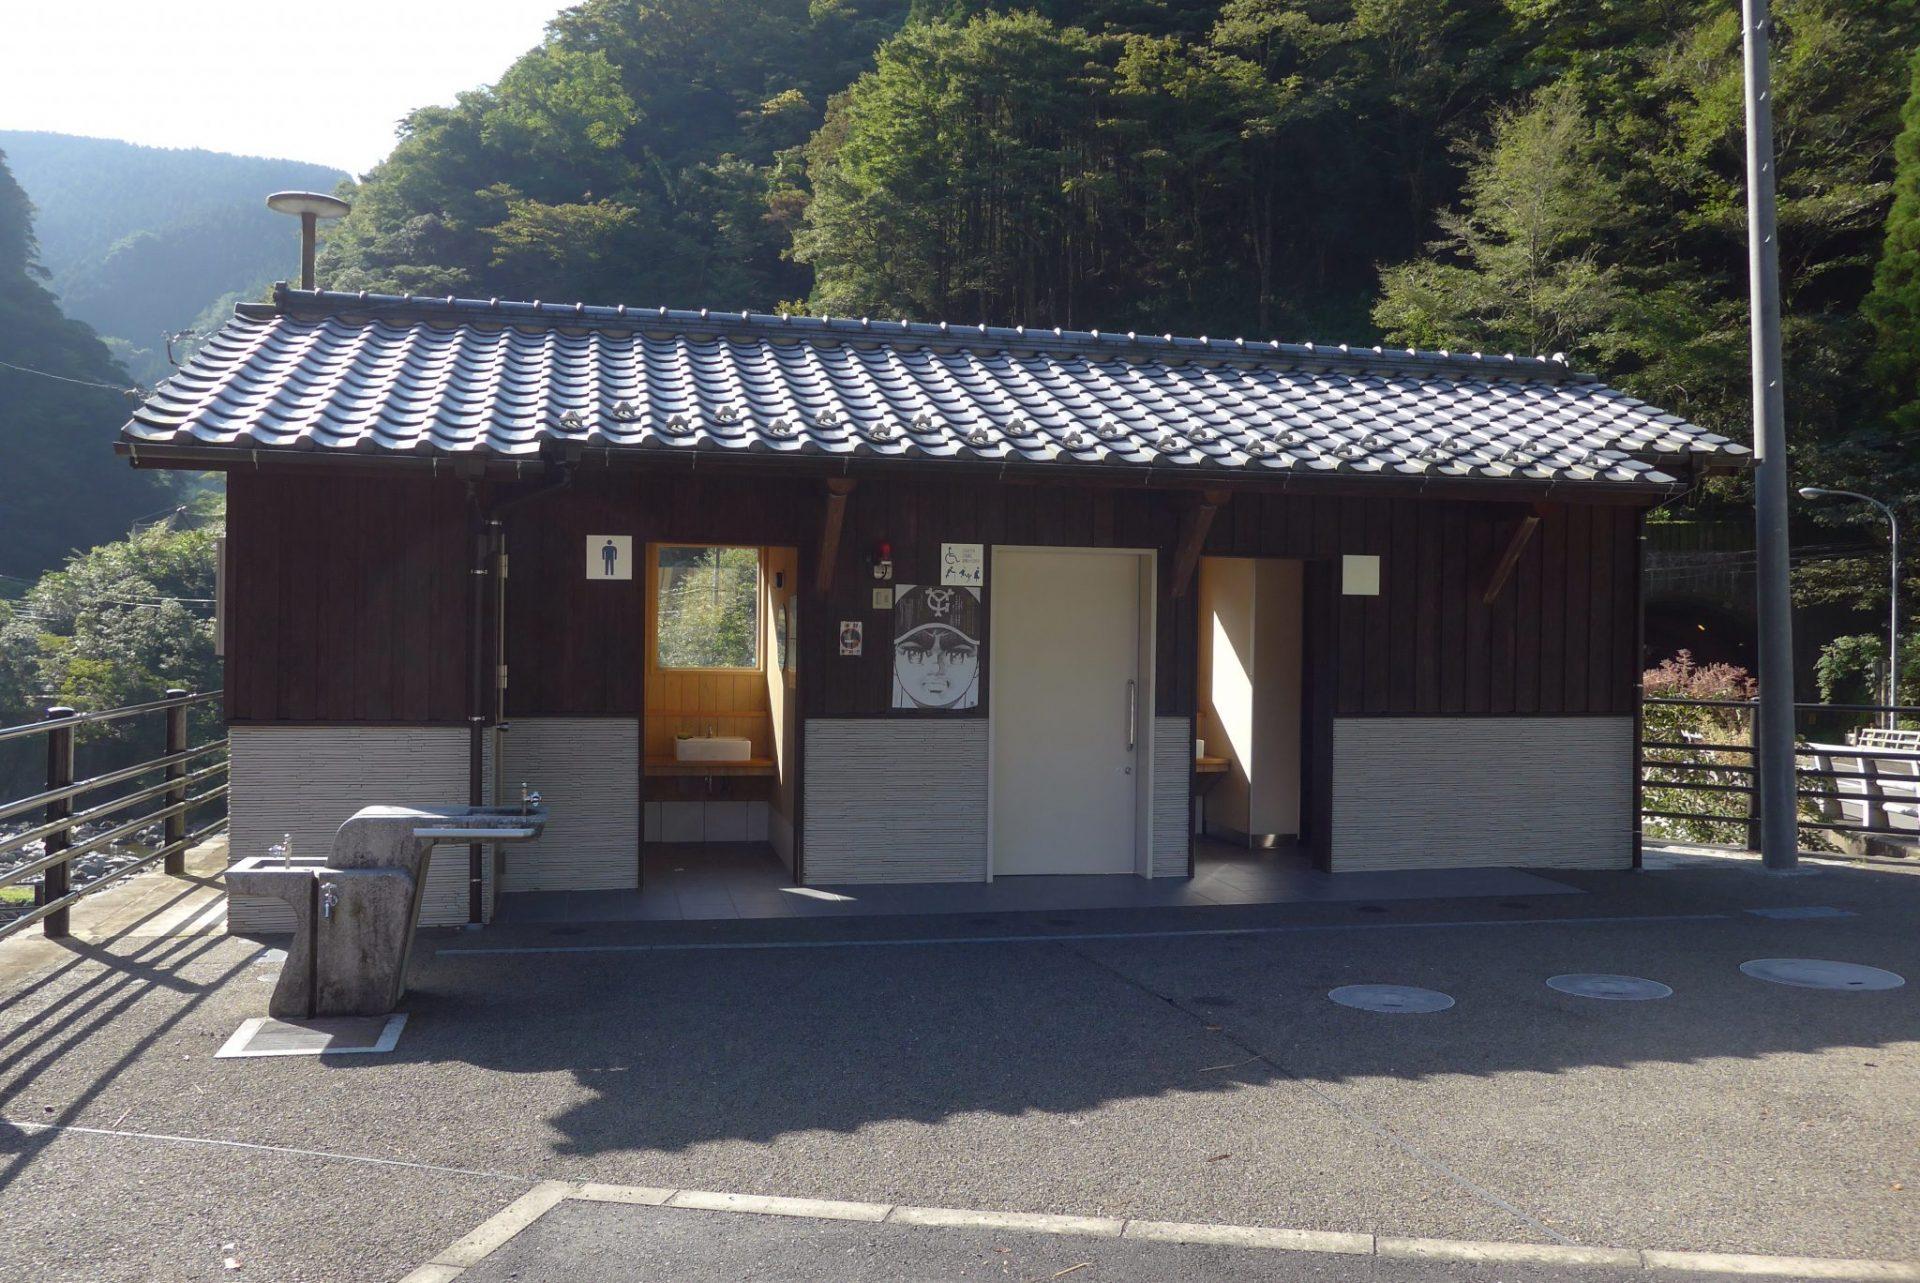 (K)熊本県五木村白滝公園の駐車場で車中泊〜紅葉や新緑も楽しみ